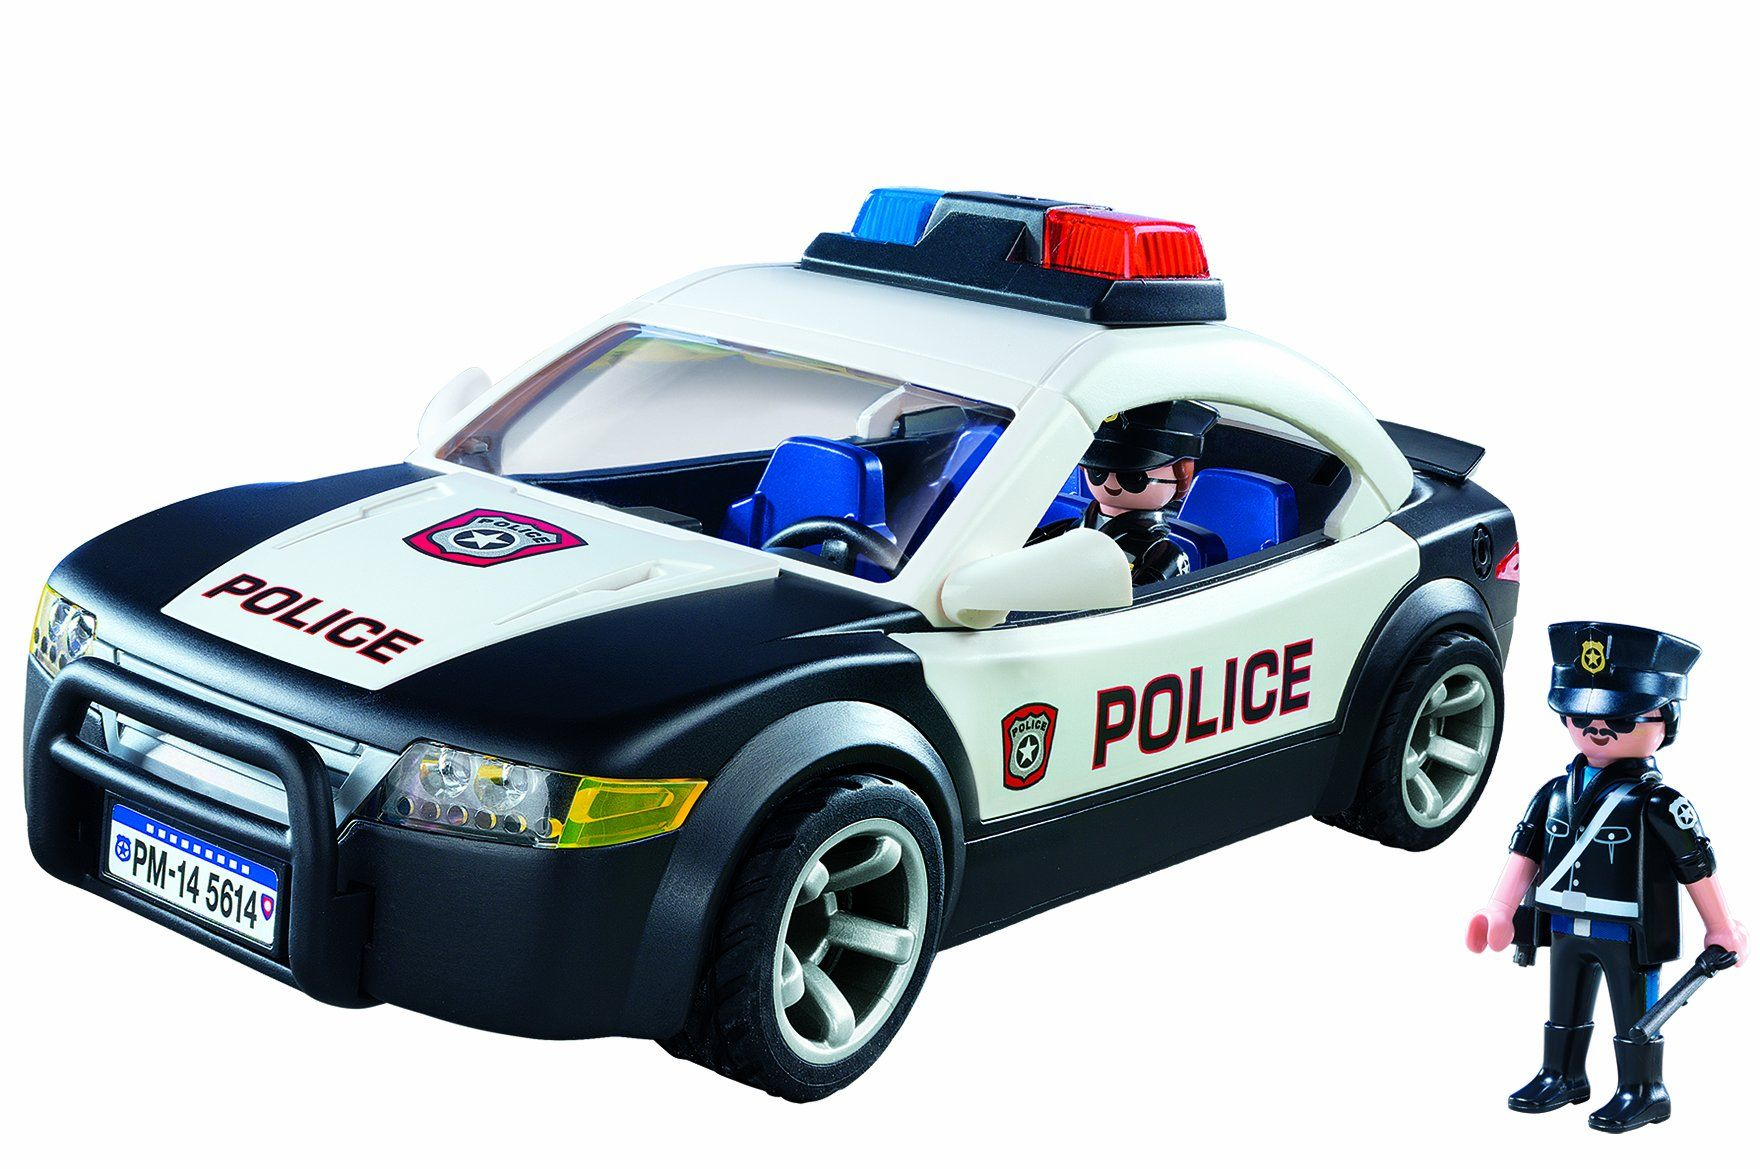 playmobil police car vehicle toys games packaging pinterest. Black Bedroom Furniture Sets. Home Design Ideas